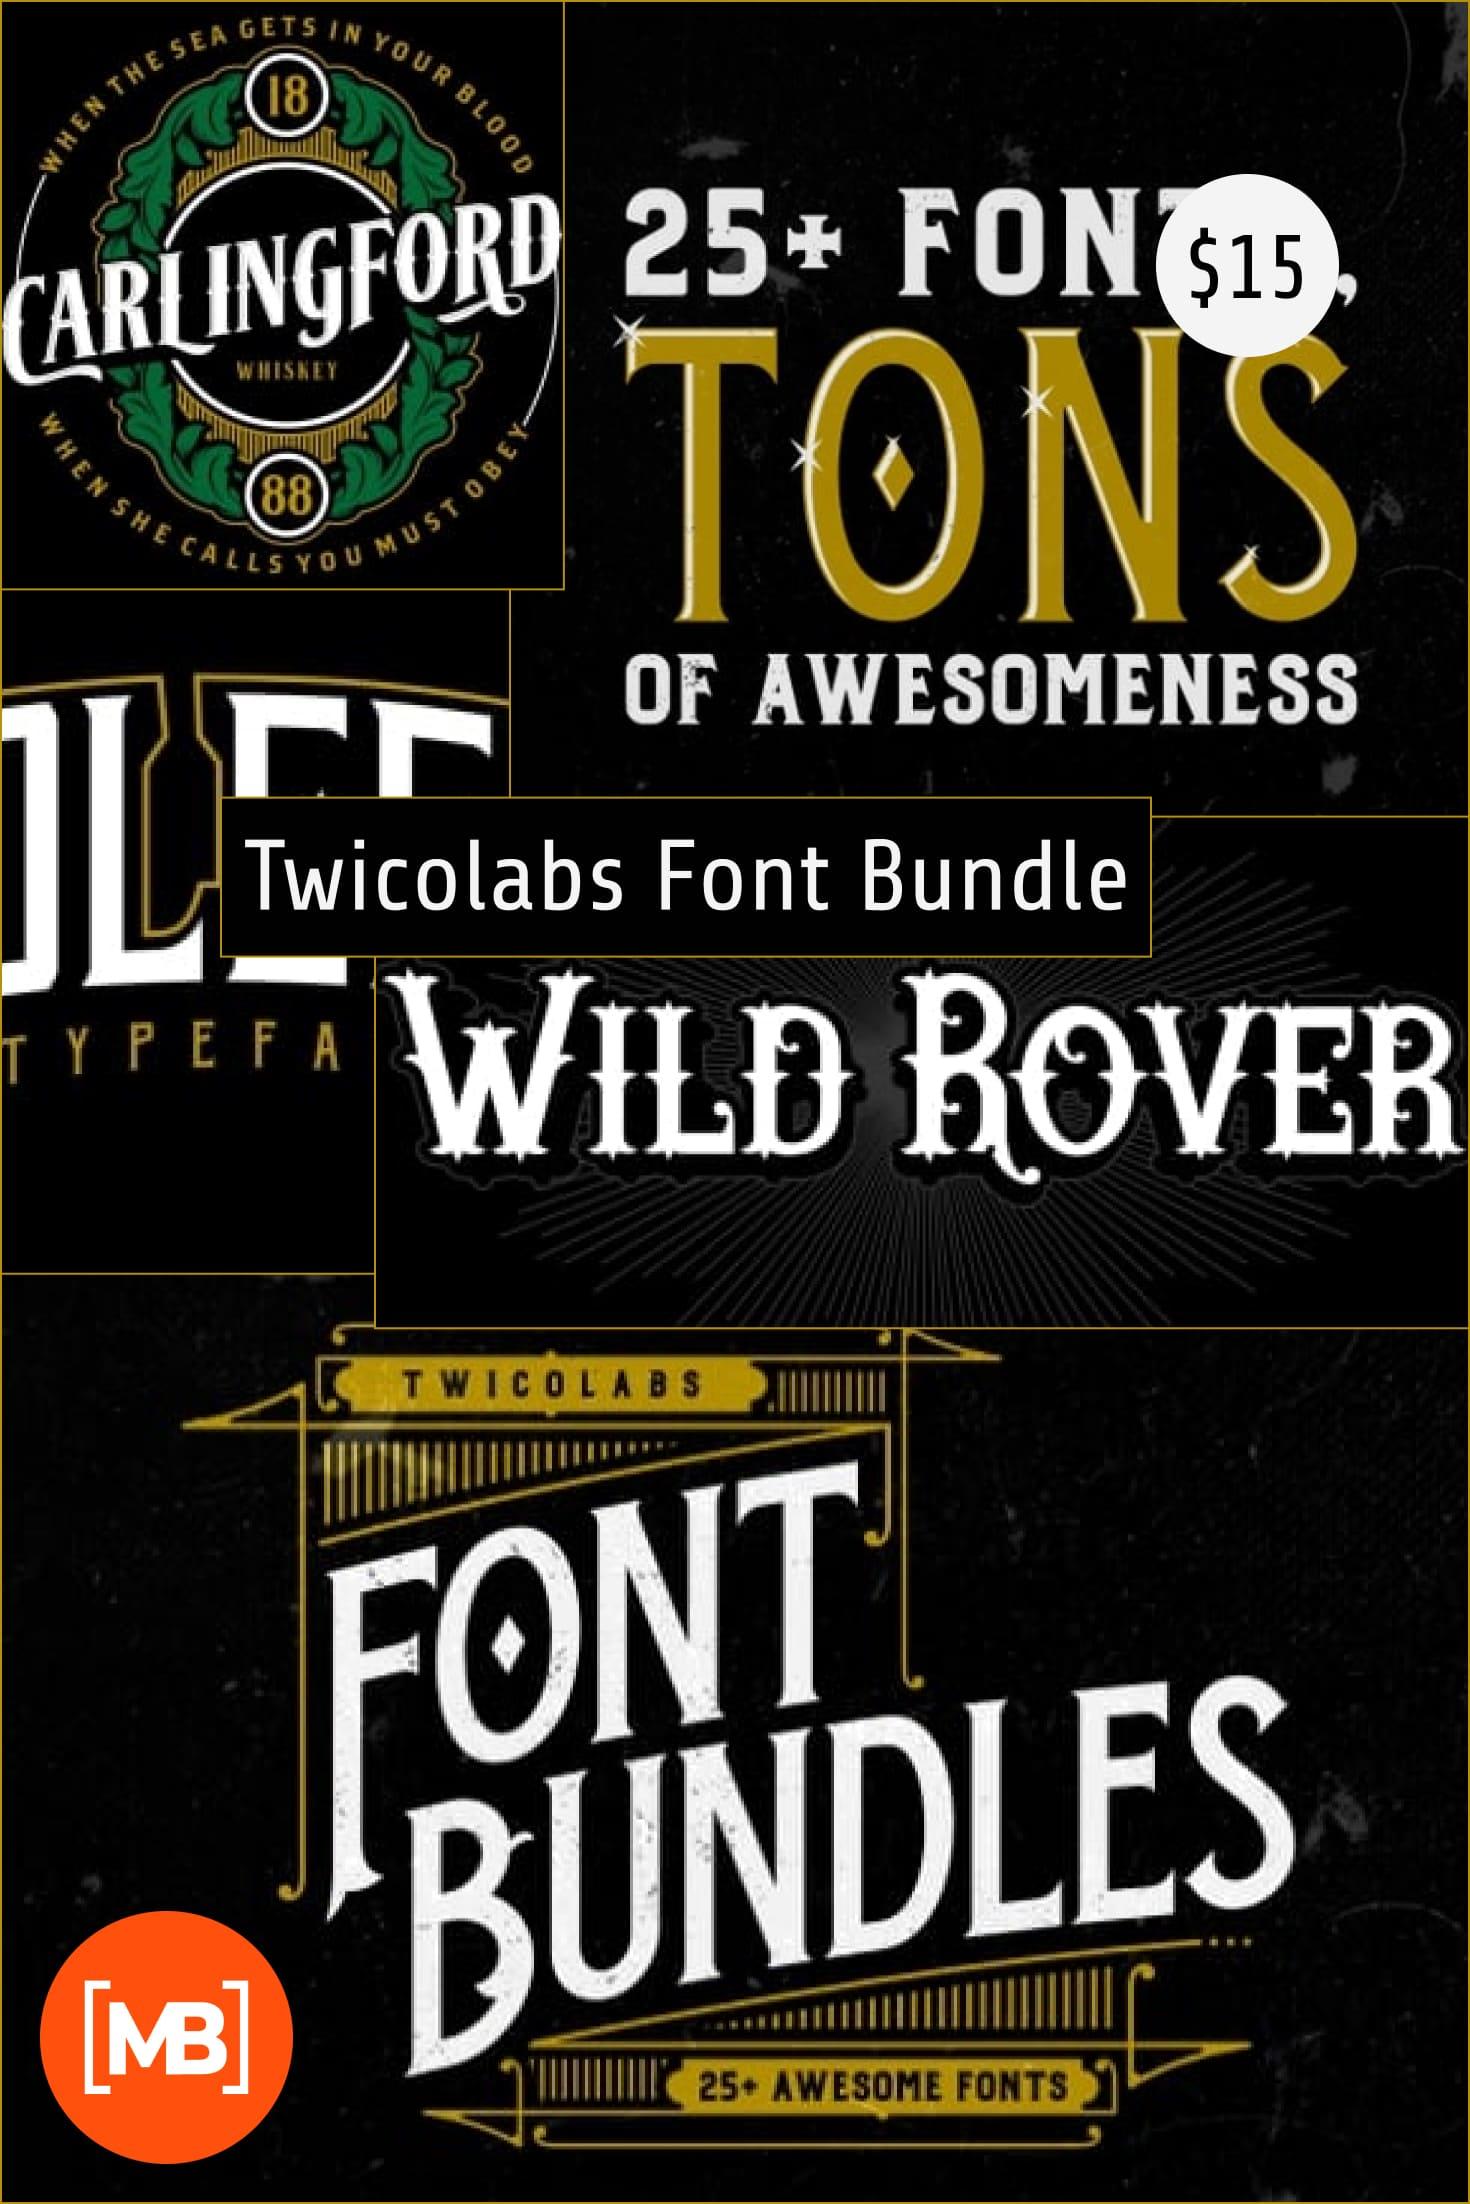 Twicolabs Font Bundle. Collage Image.